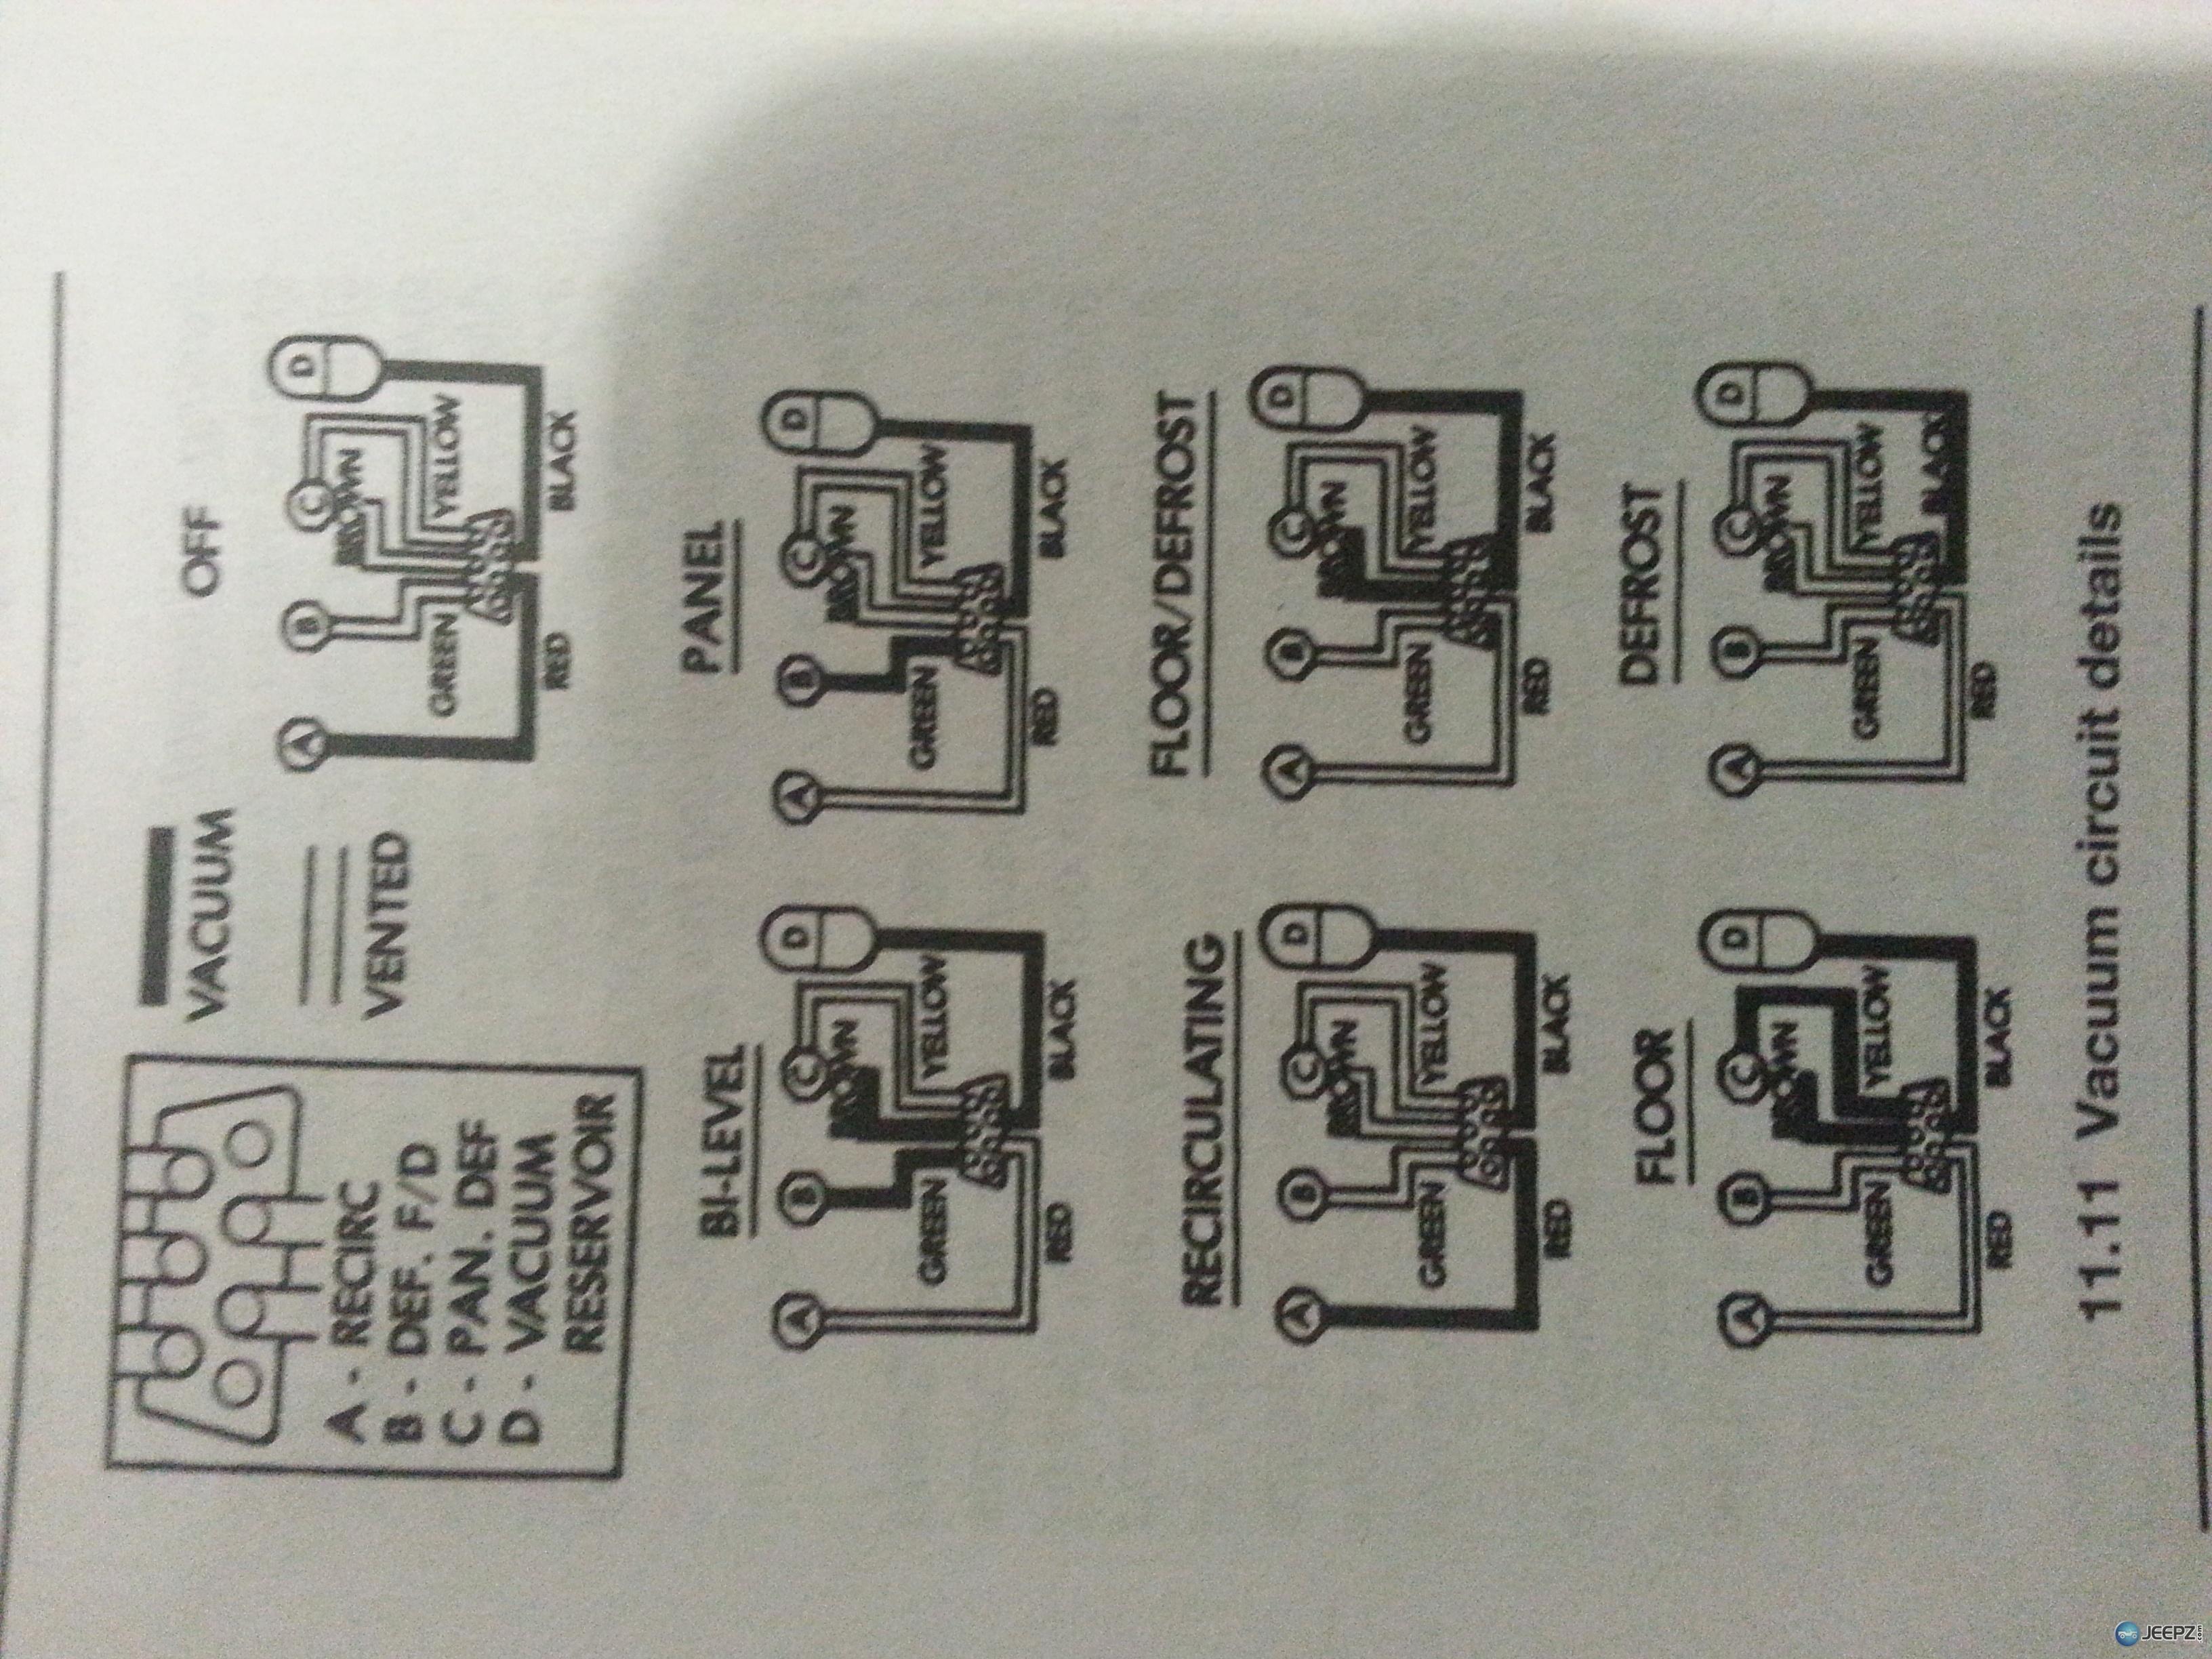 1998 jeep grand cherokee blower motor wiring diagram 1998 1999 jeep grand cherokee blower motor resistor wiring diagram on 1998 jeep grand cherokee blower motor